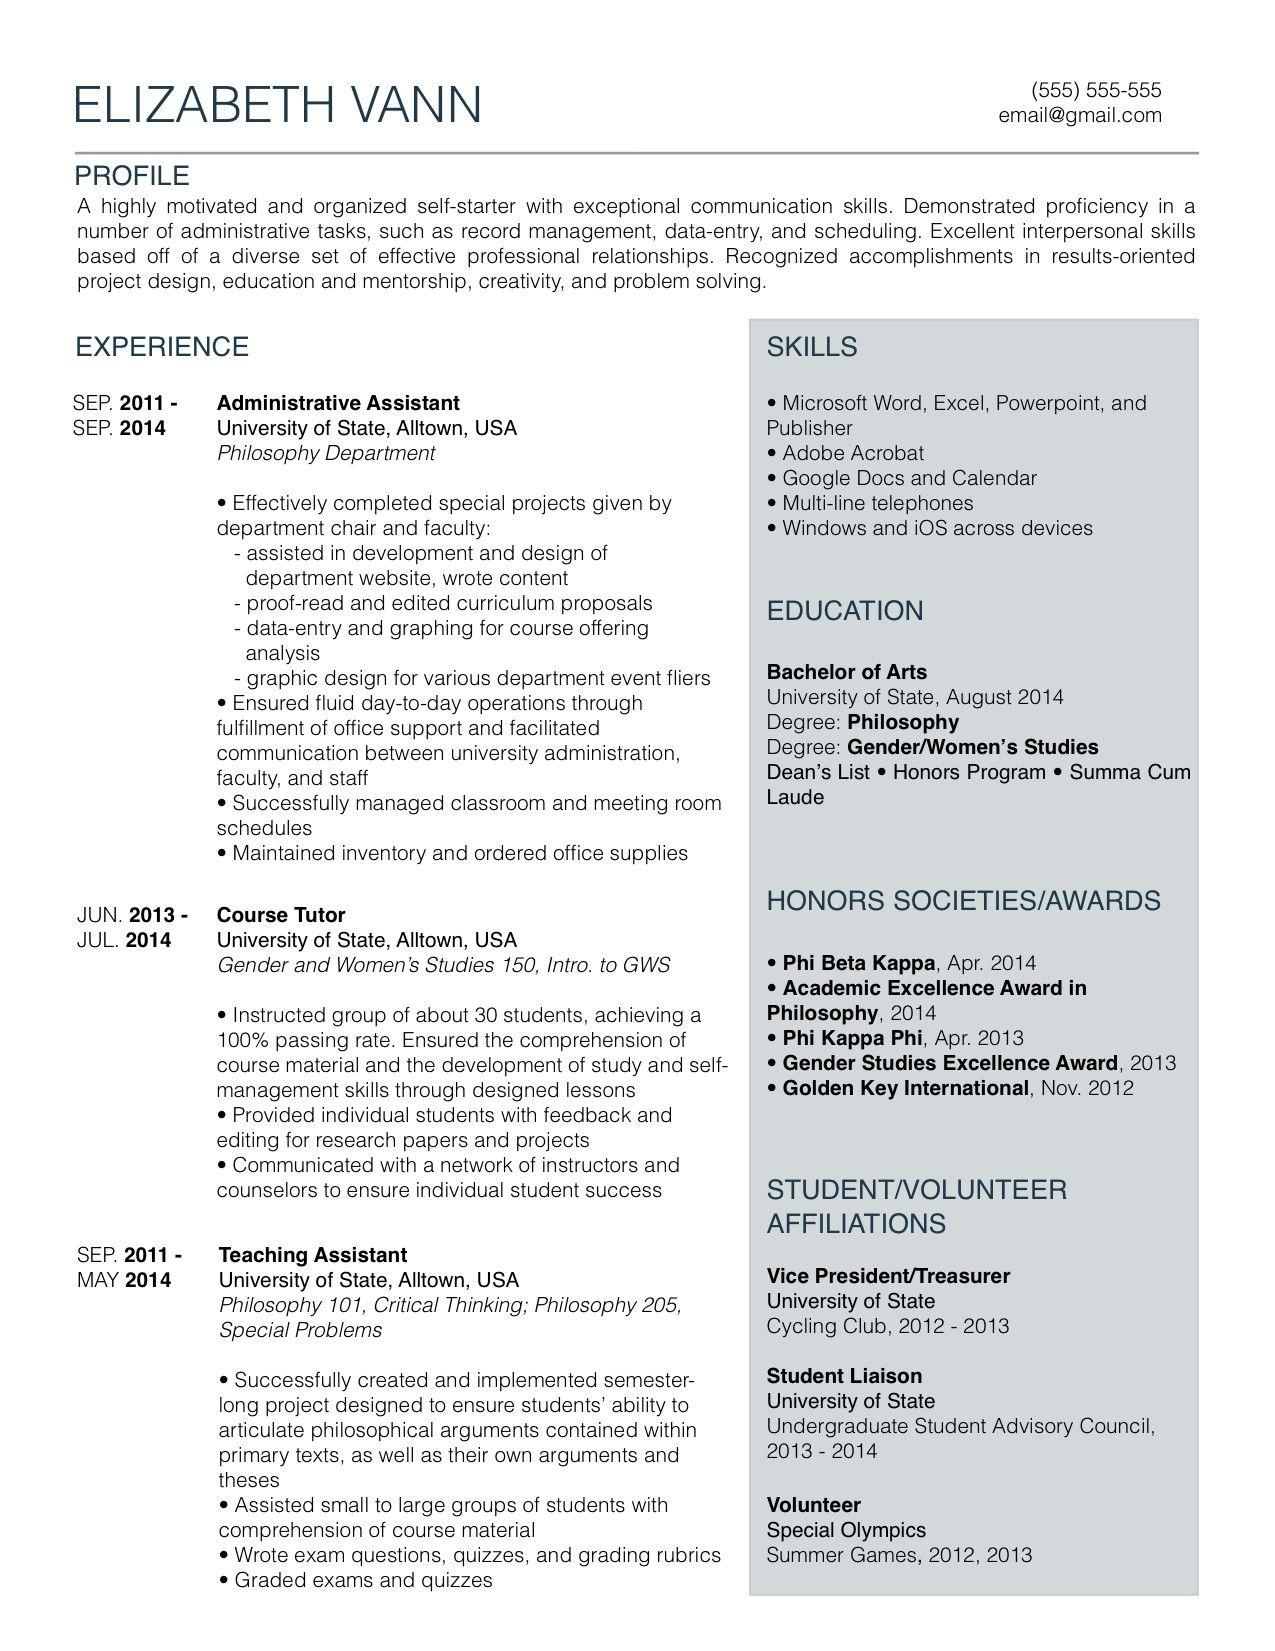 Resume Examples Reddit | Resume Examples | Pinterest | Resume ...